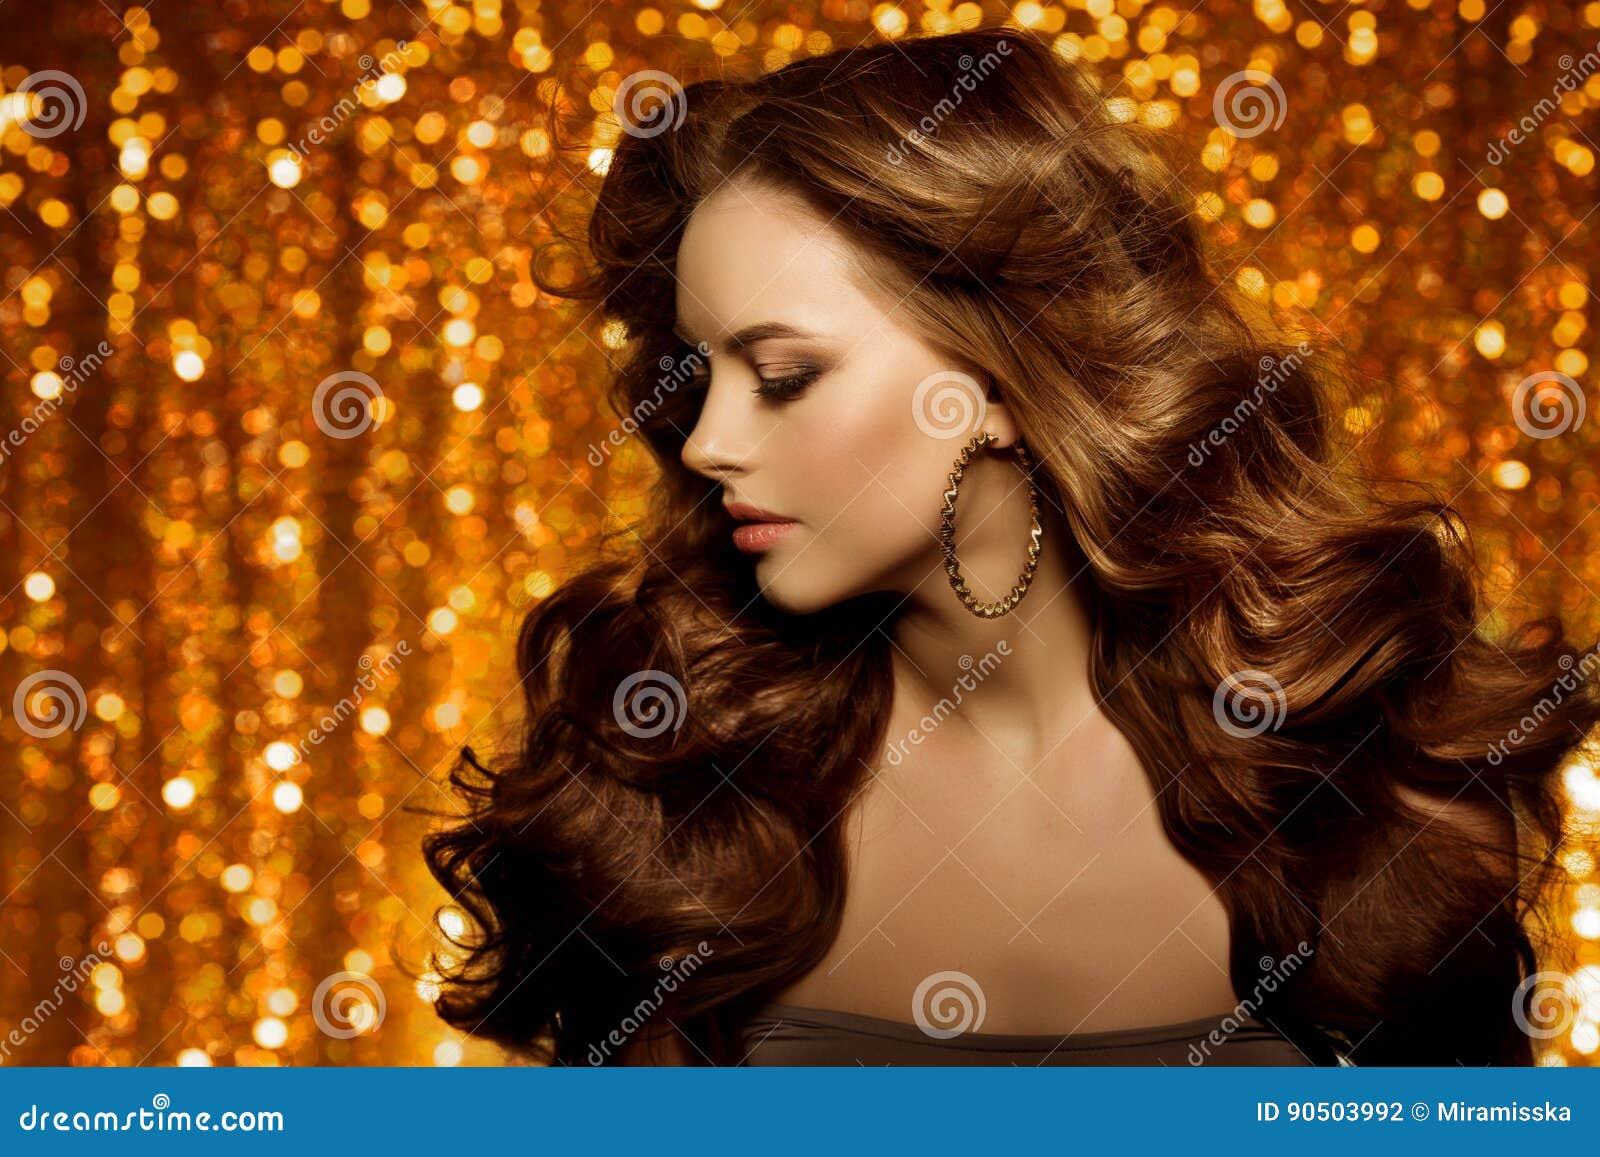 Golden beautiful fashion woman, model with shiny healthy long v